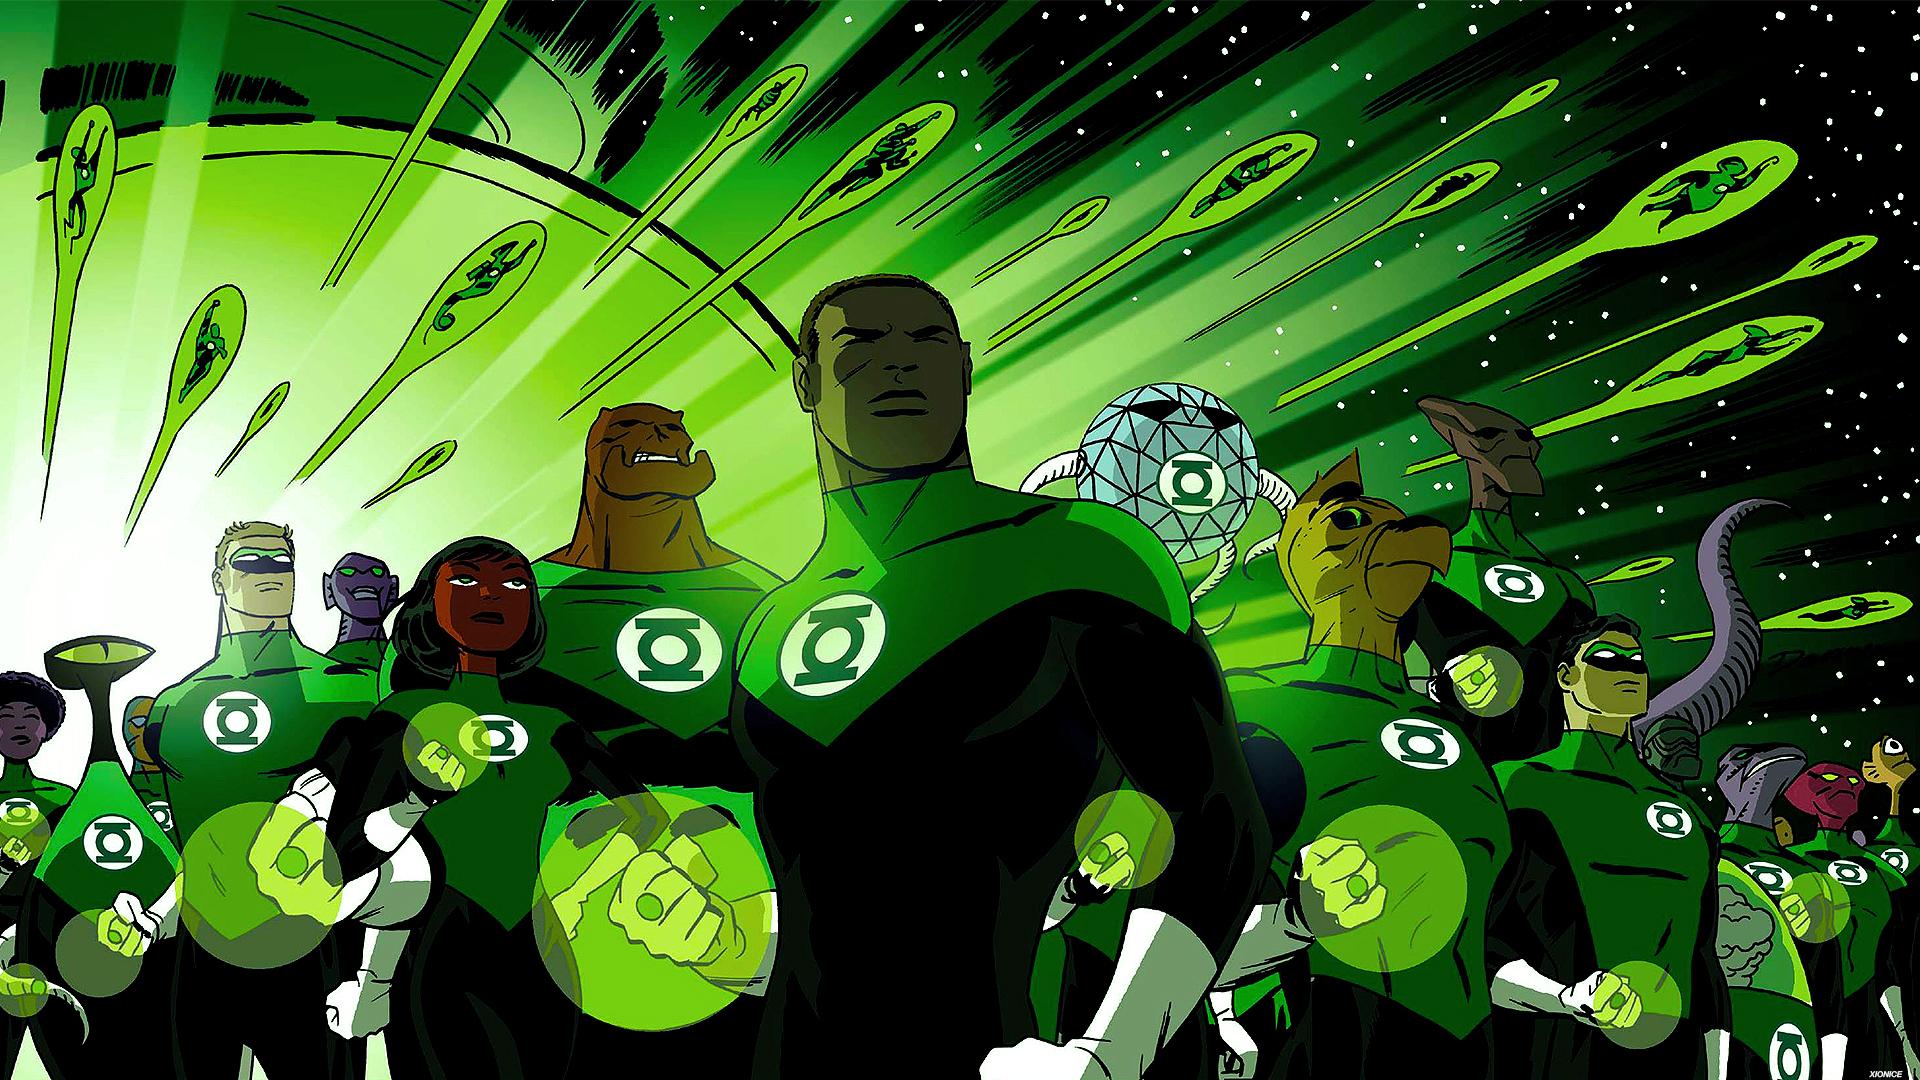 green lantern artwork wallpaper - photo #26